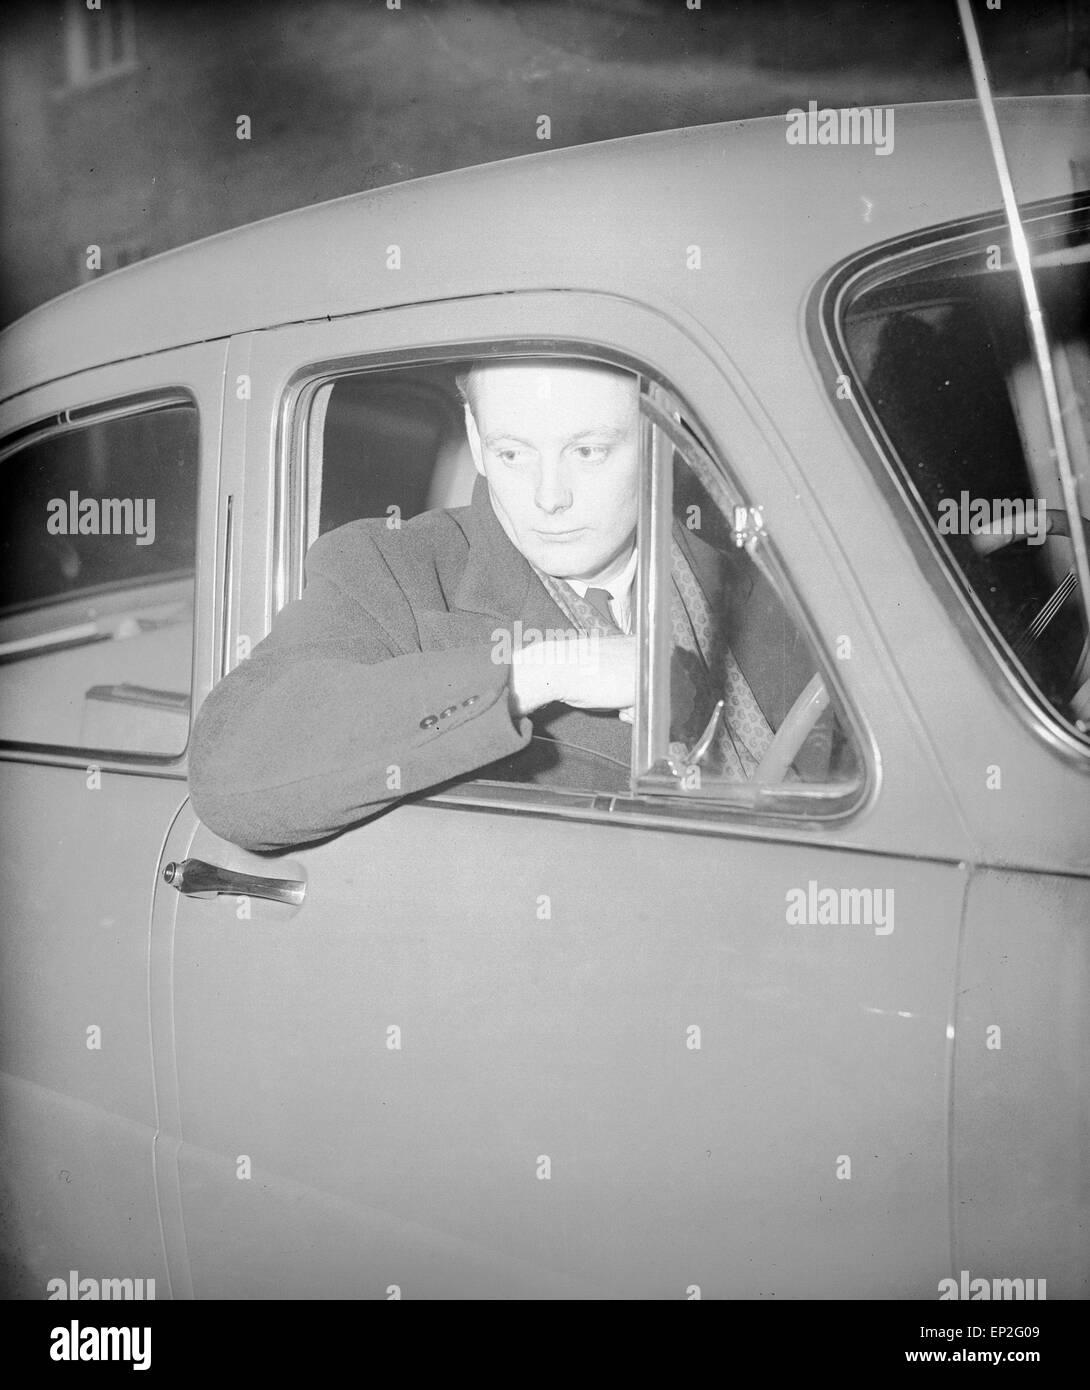 Edward Douglas-Scott-Montagu, 3rd Baron Montagu of Beaulieu, at Winchester Crown Court, 17th March 1954. - Stock Image